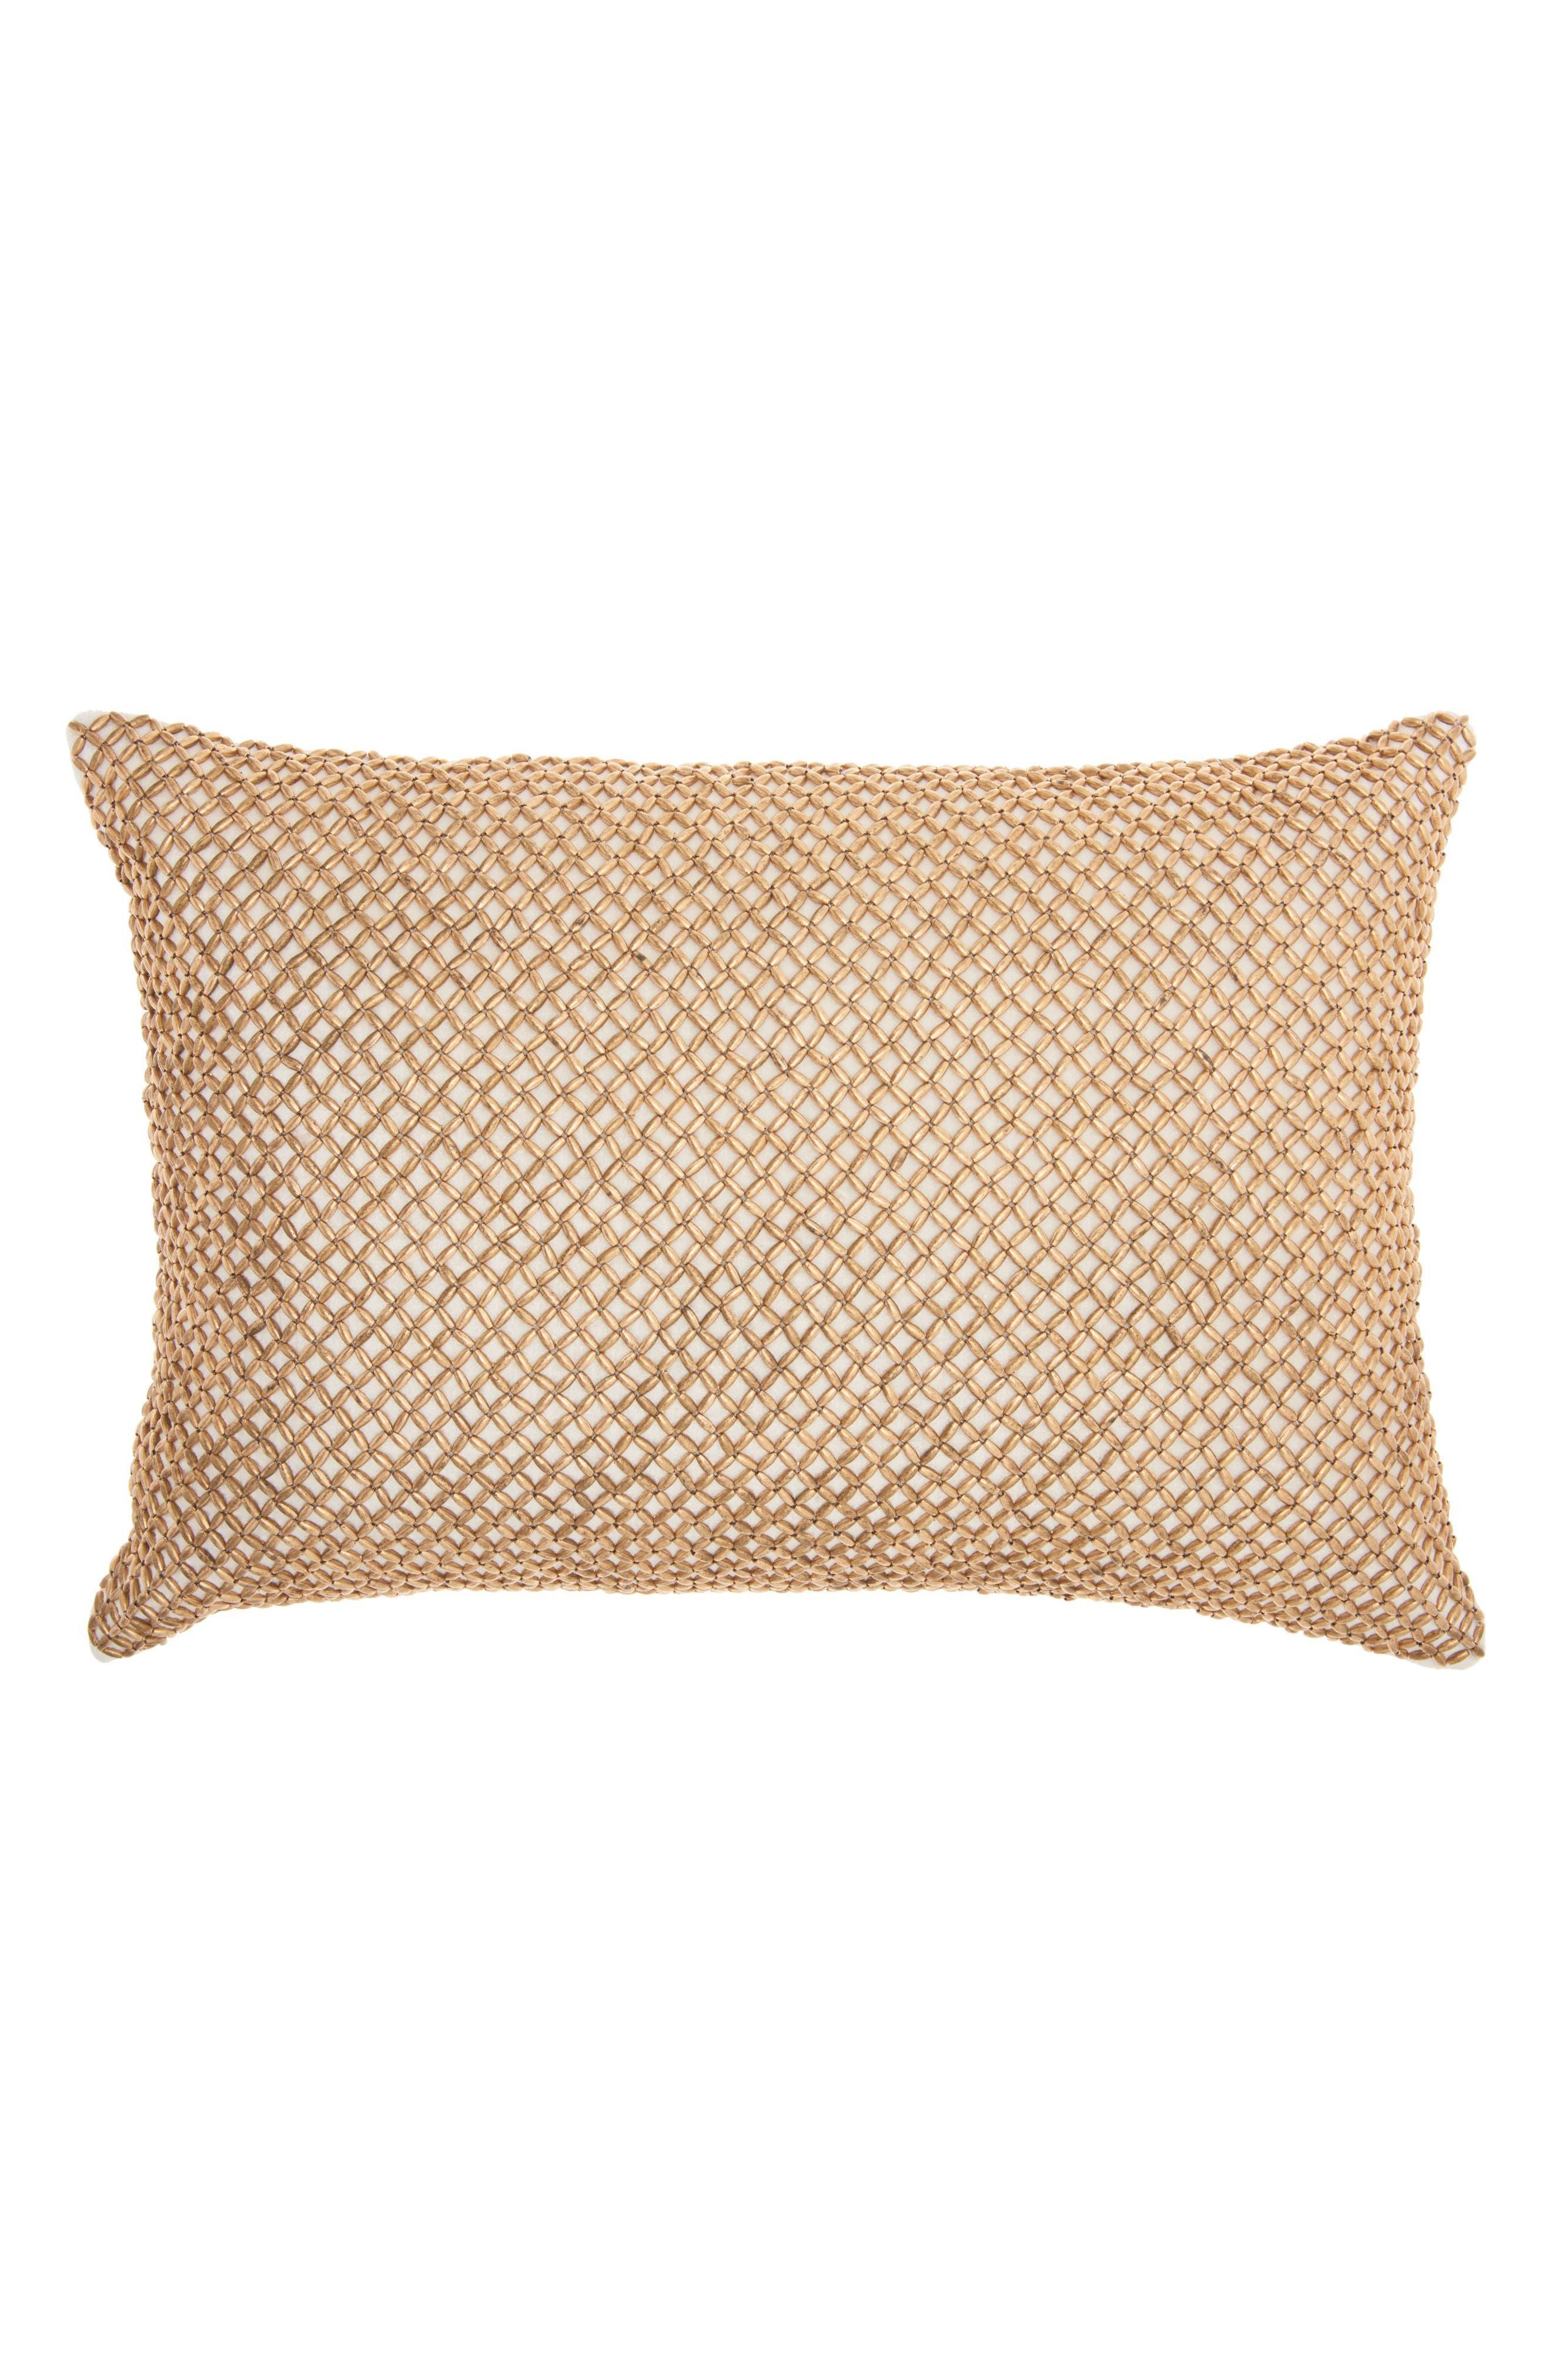 Cobble Jewel Accent Pillow,                         Main,                         color, Cream